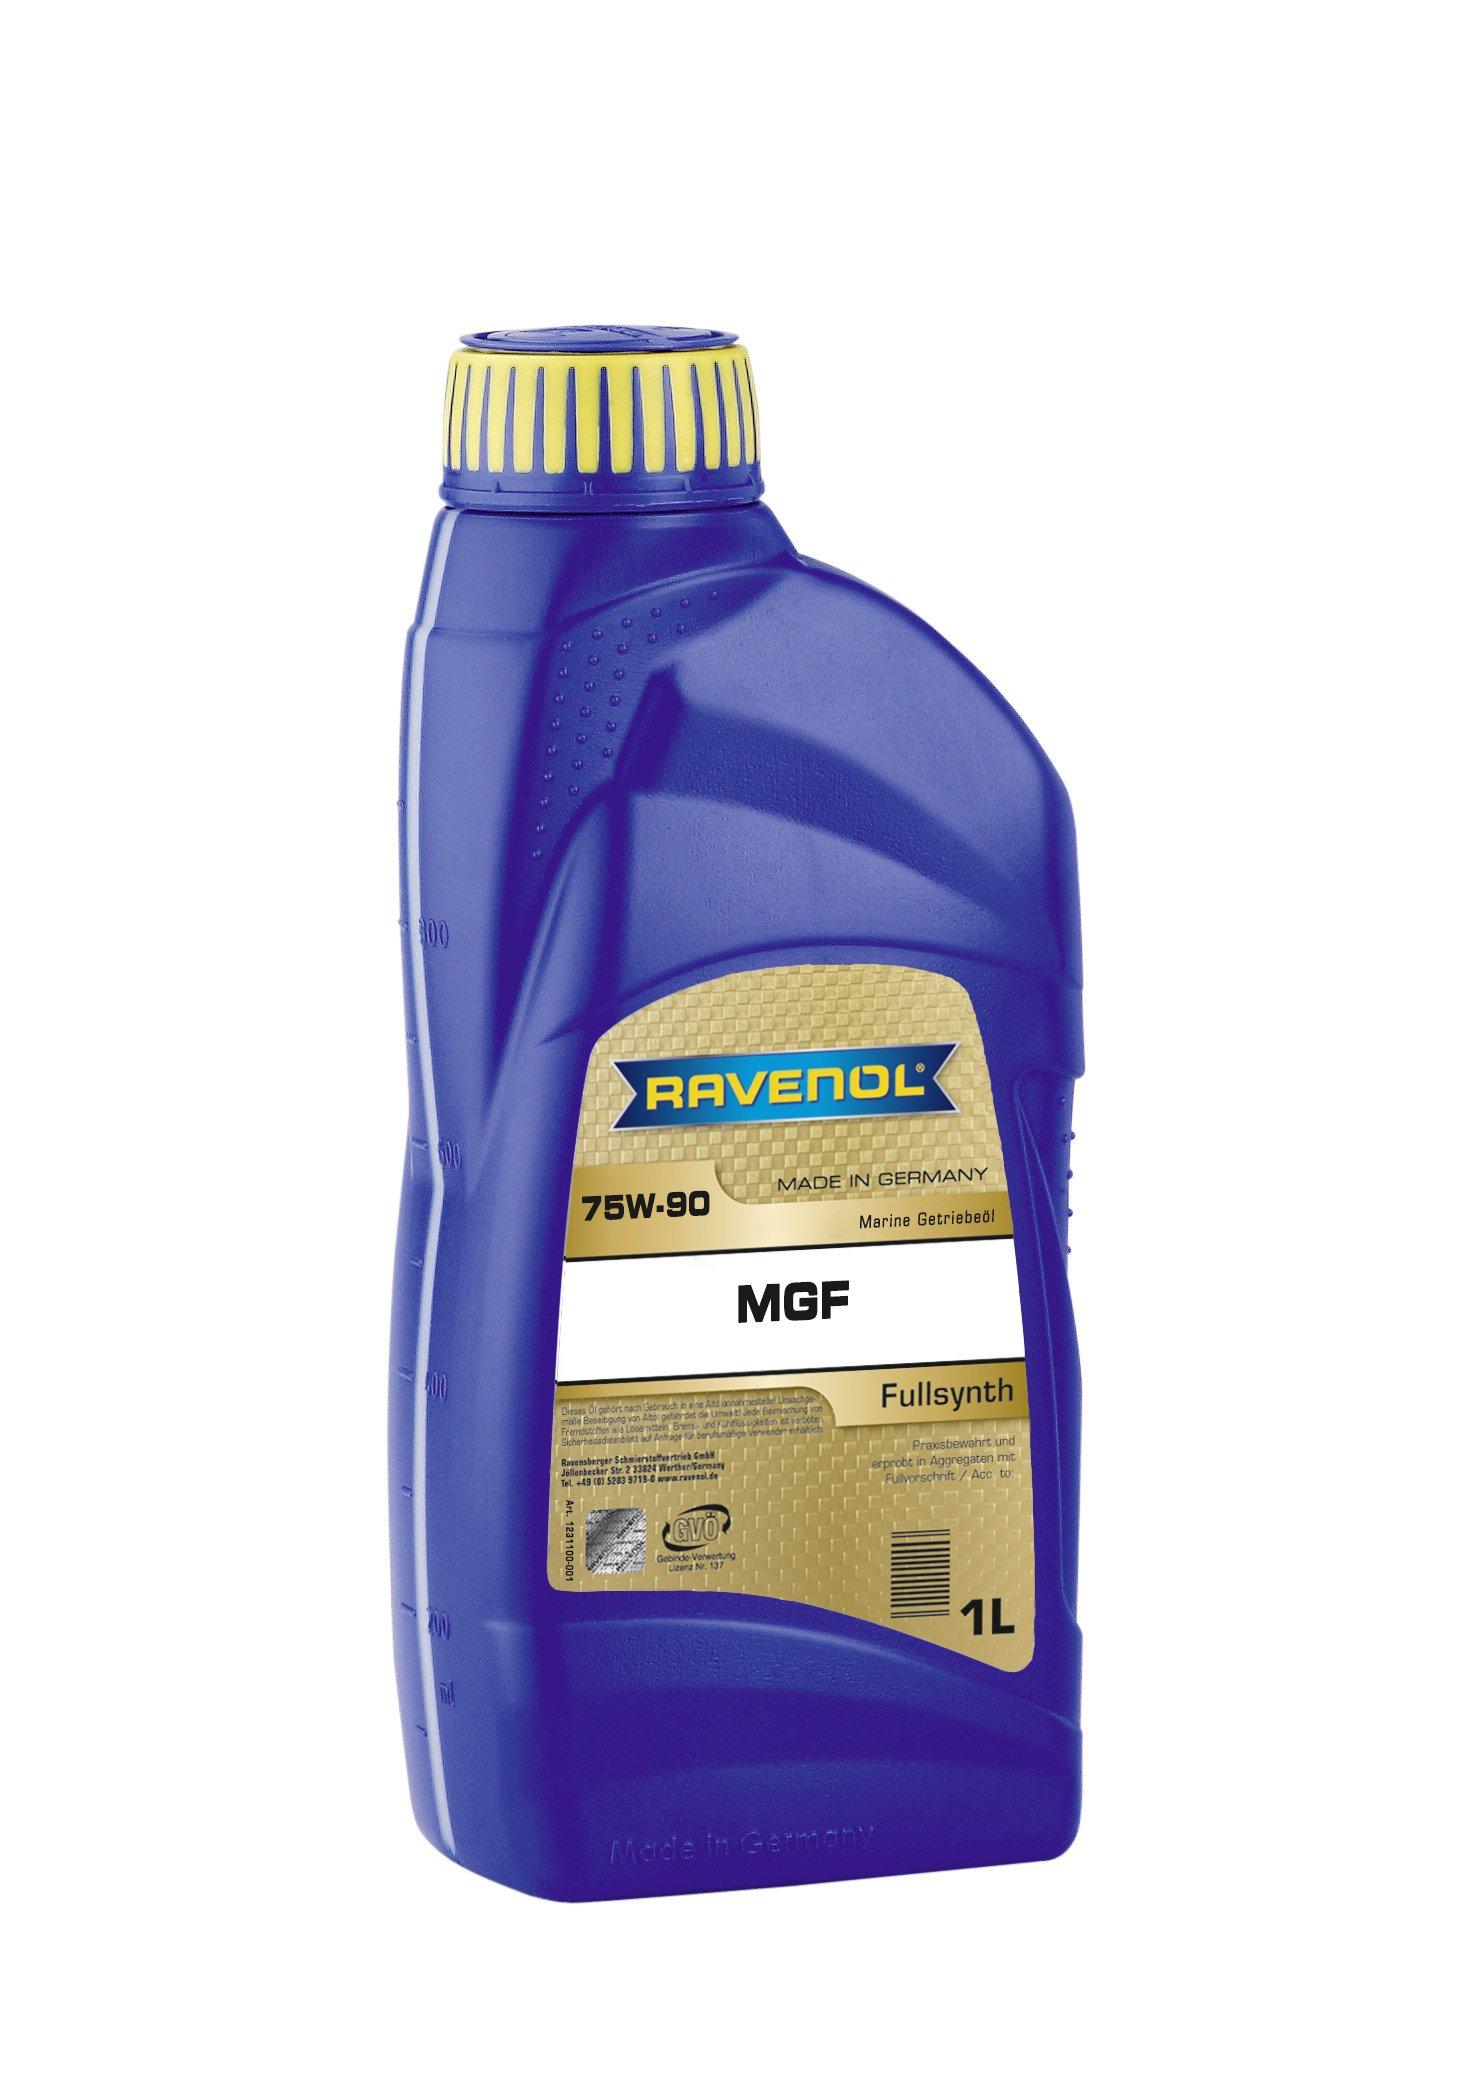 RAVENOL J1V2289-001 SAE 75W-90 Marine Gear Oil - GL-4/GL-5 Synthetic (1 Liter)